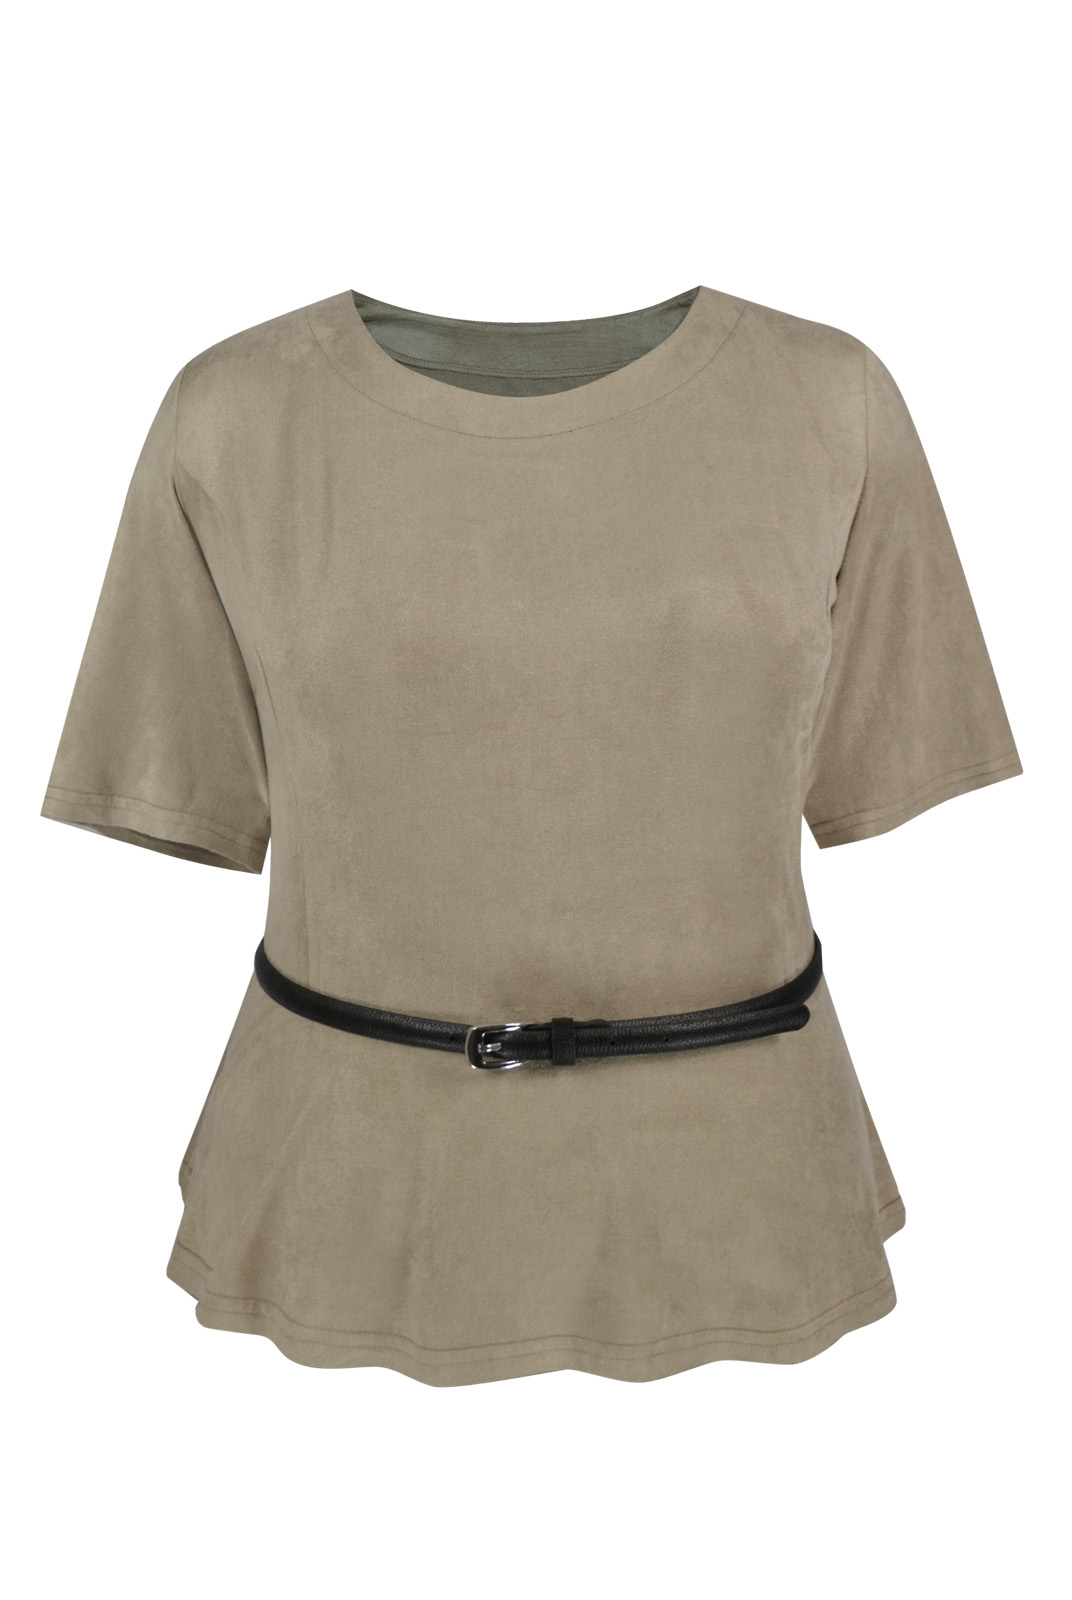 Блузки Трикотаж Купить